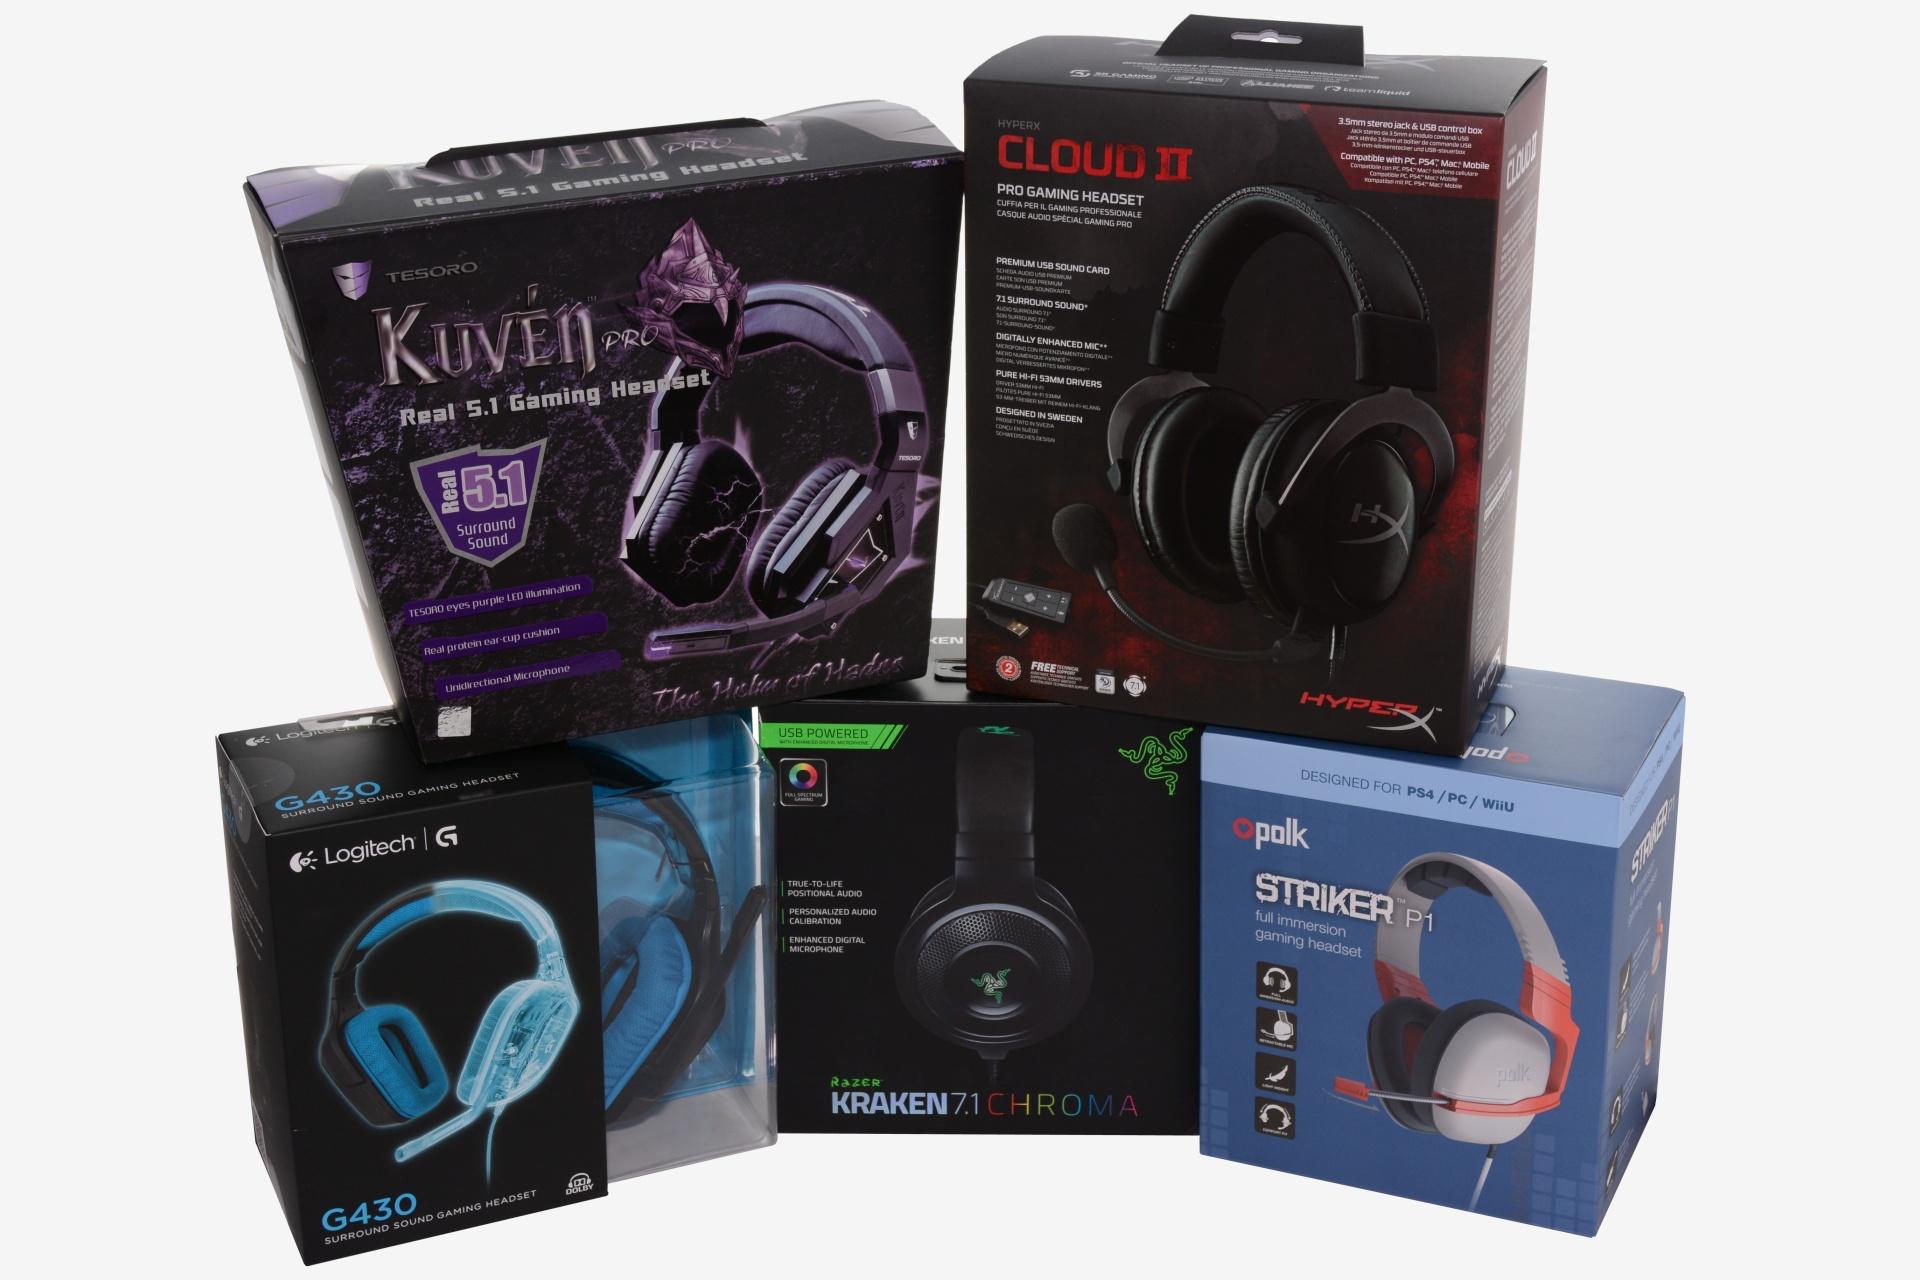 Sub-$100 Gaming Headset Roundup Photo Gallery - TechSpot